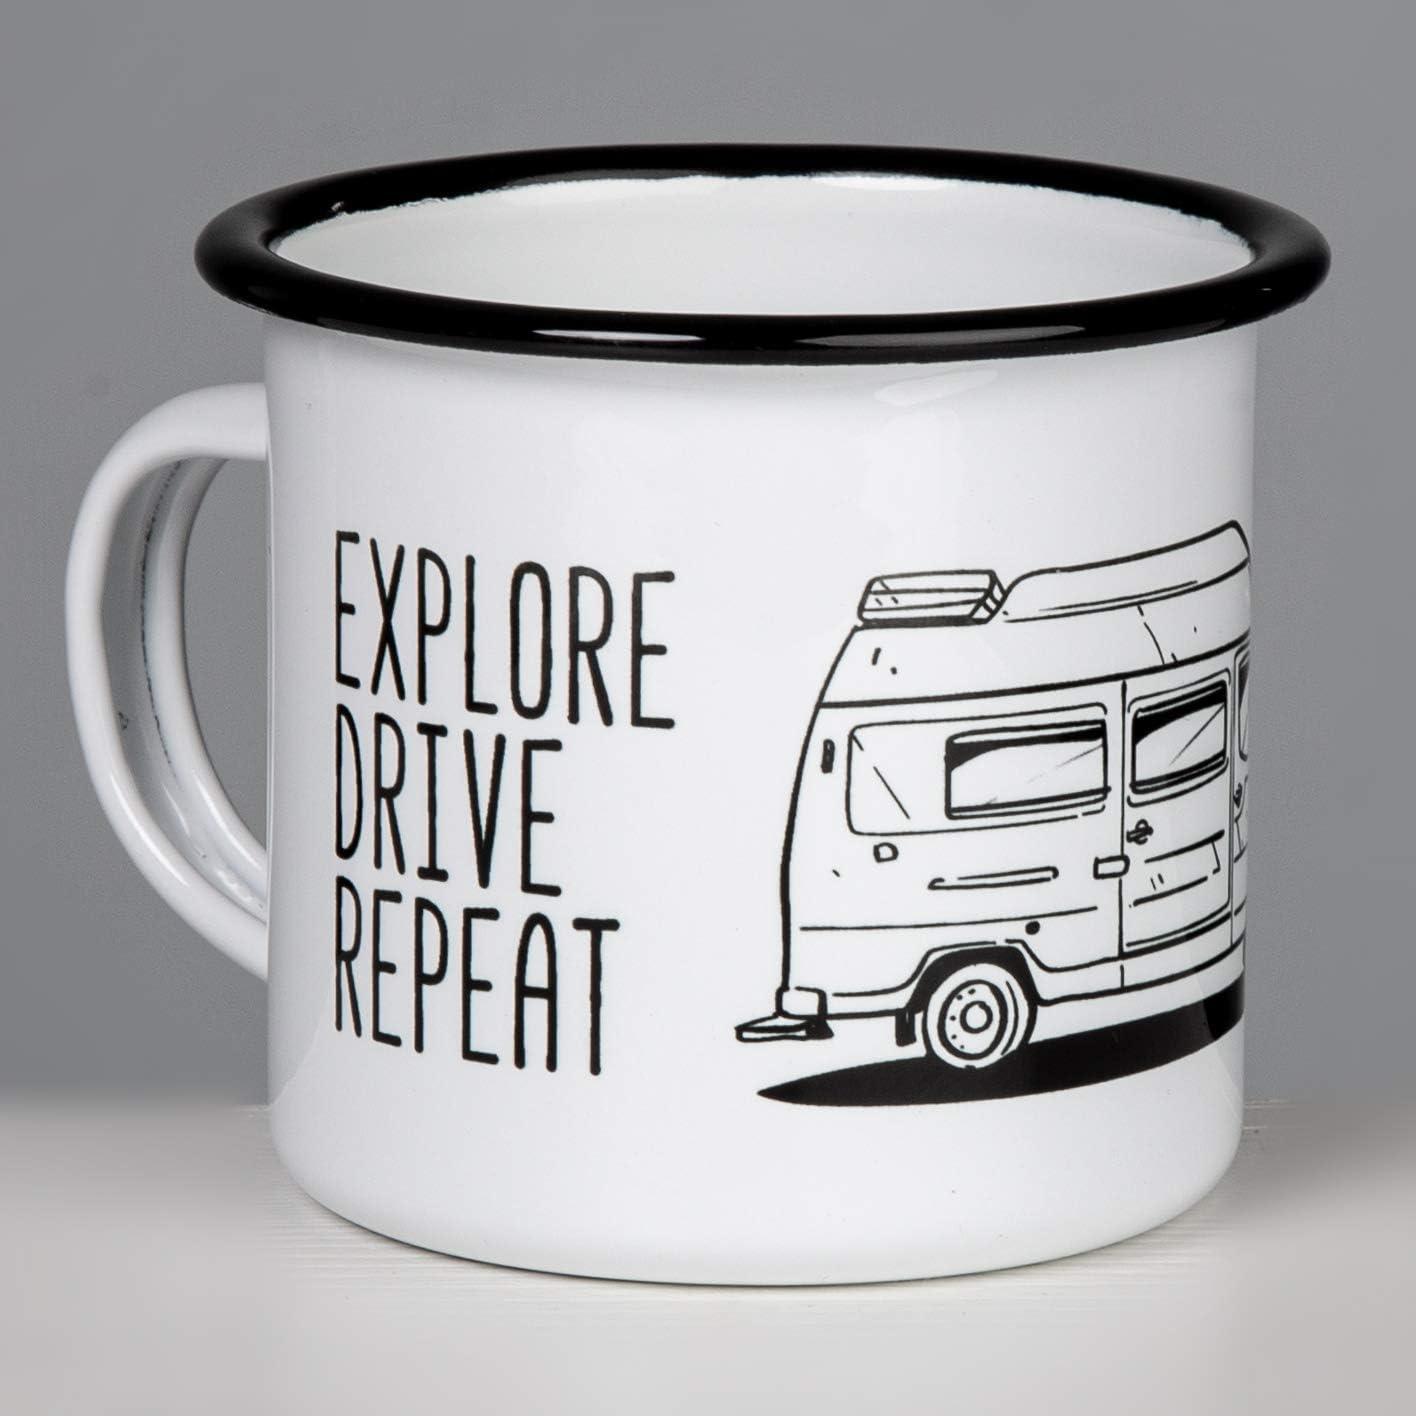 307 Explore Drive Repeat Vanlife per Campeggio di MUGSY.de. Eat Sleep Camp James Cook Westfalia Tazza Smaltata di Alta qualit/à con Mercedes Benz Camper Leggera e Robusta Bremer